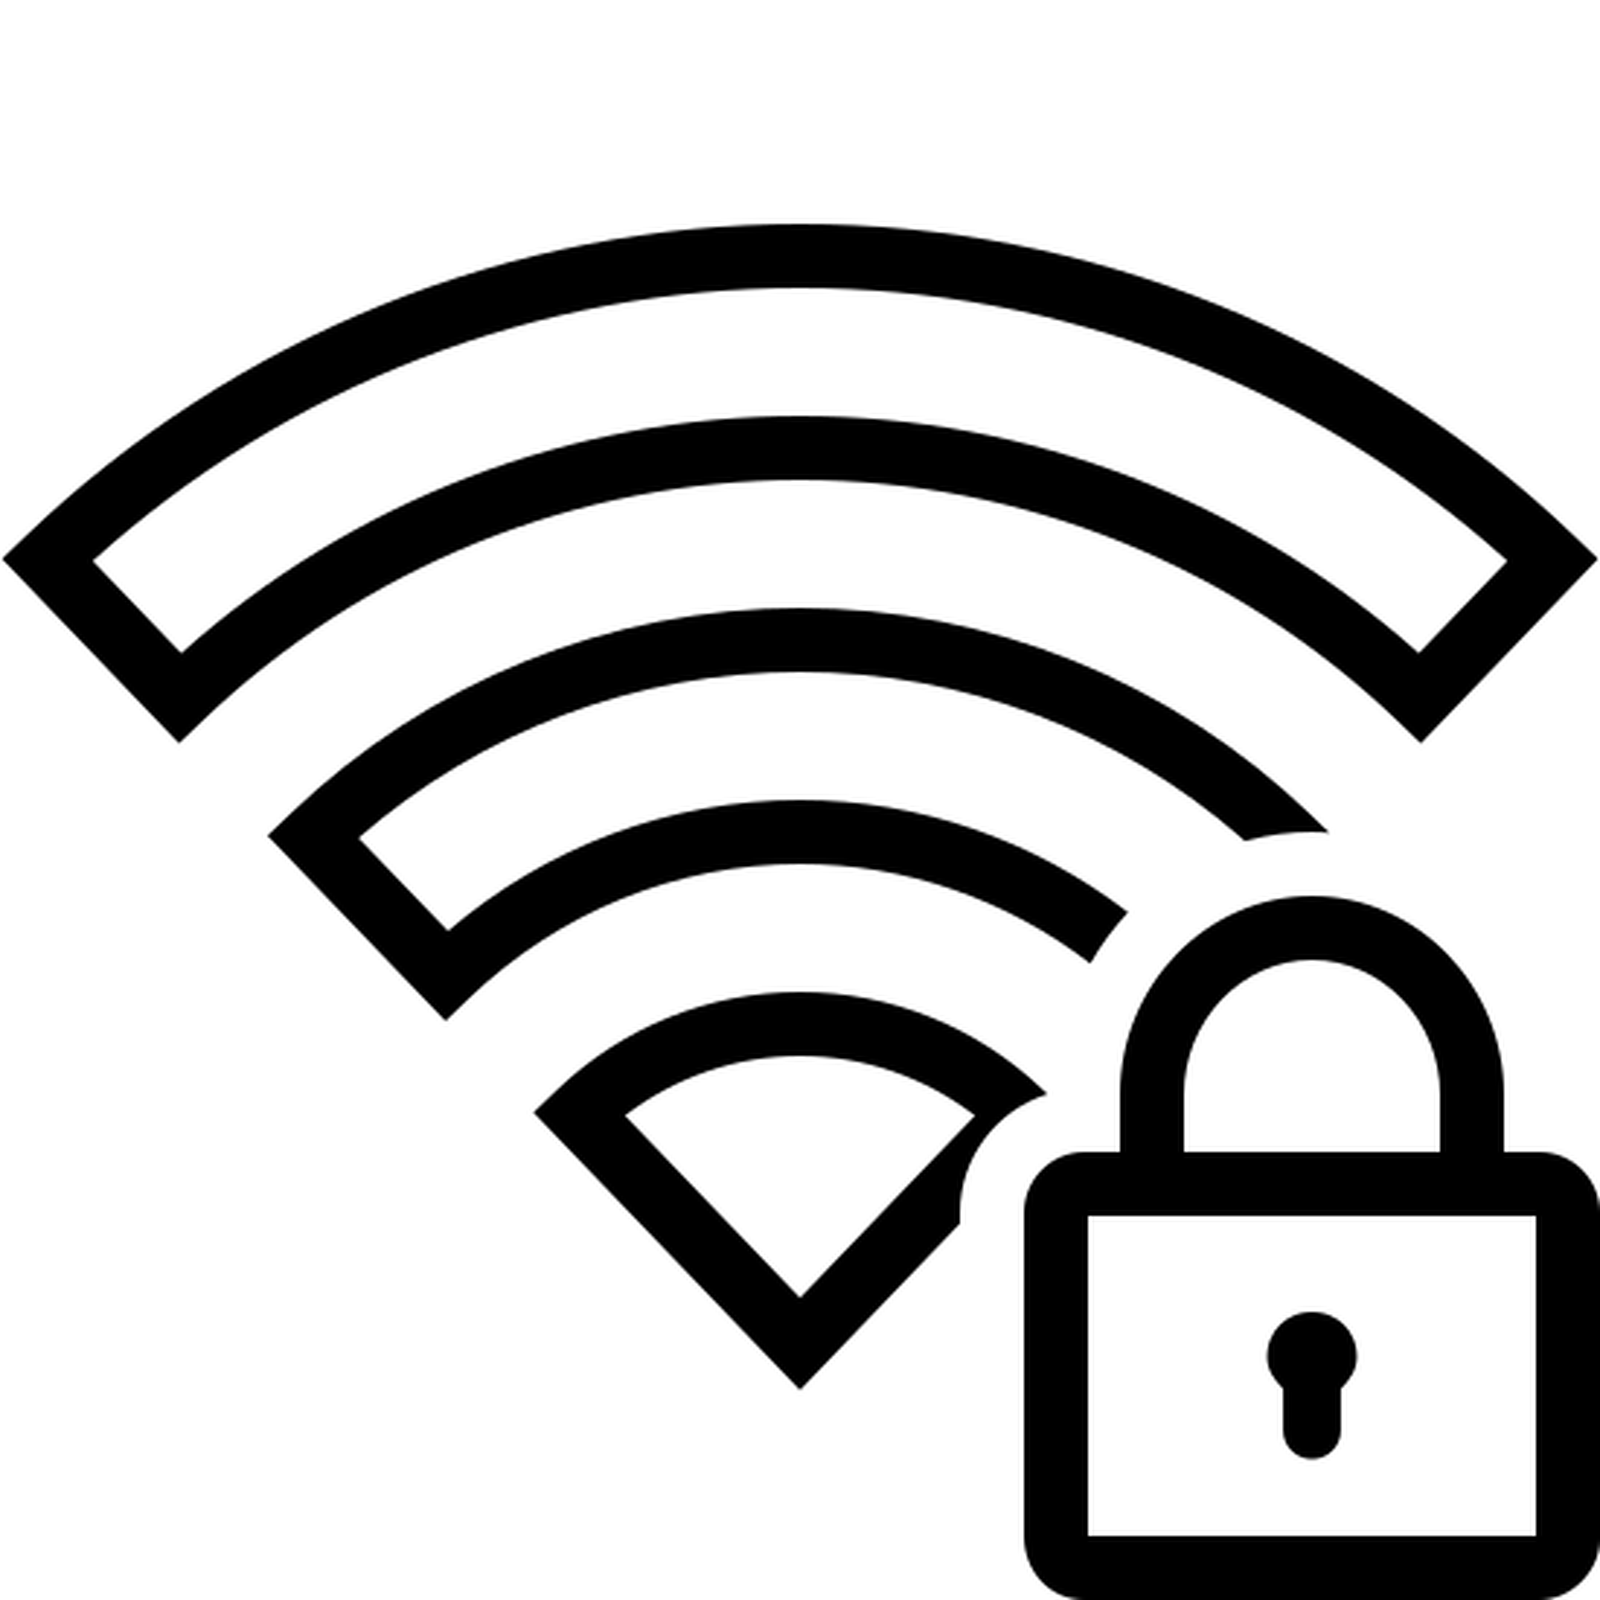 Blokada Wifi icon